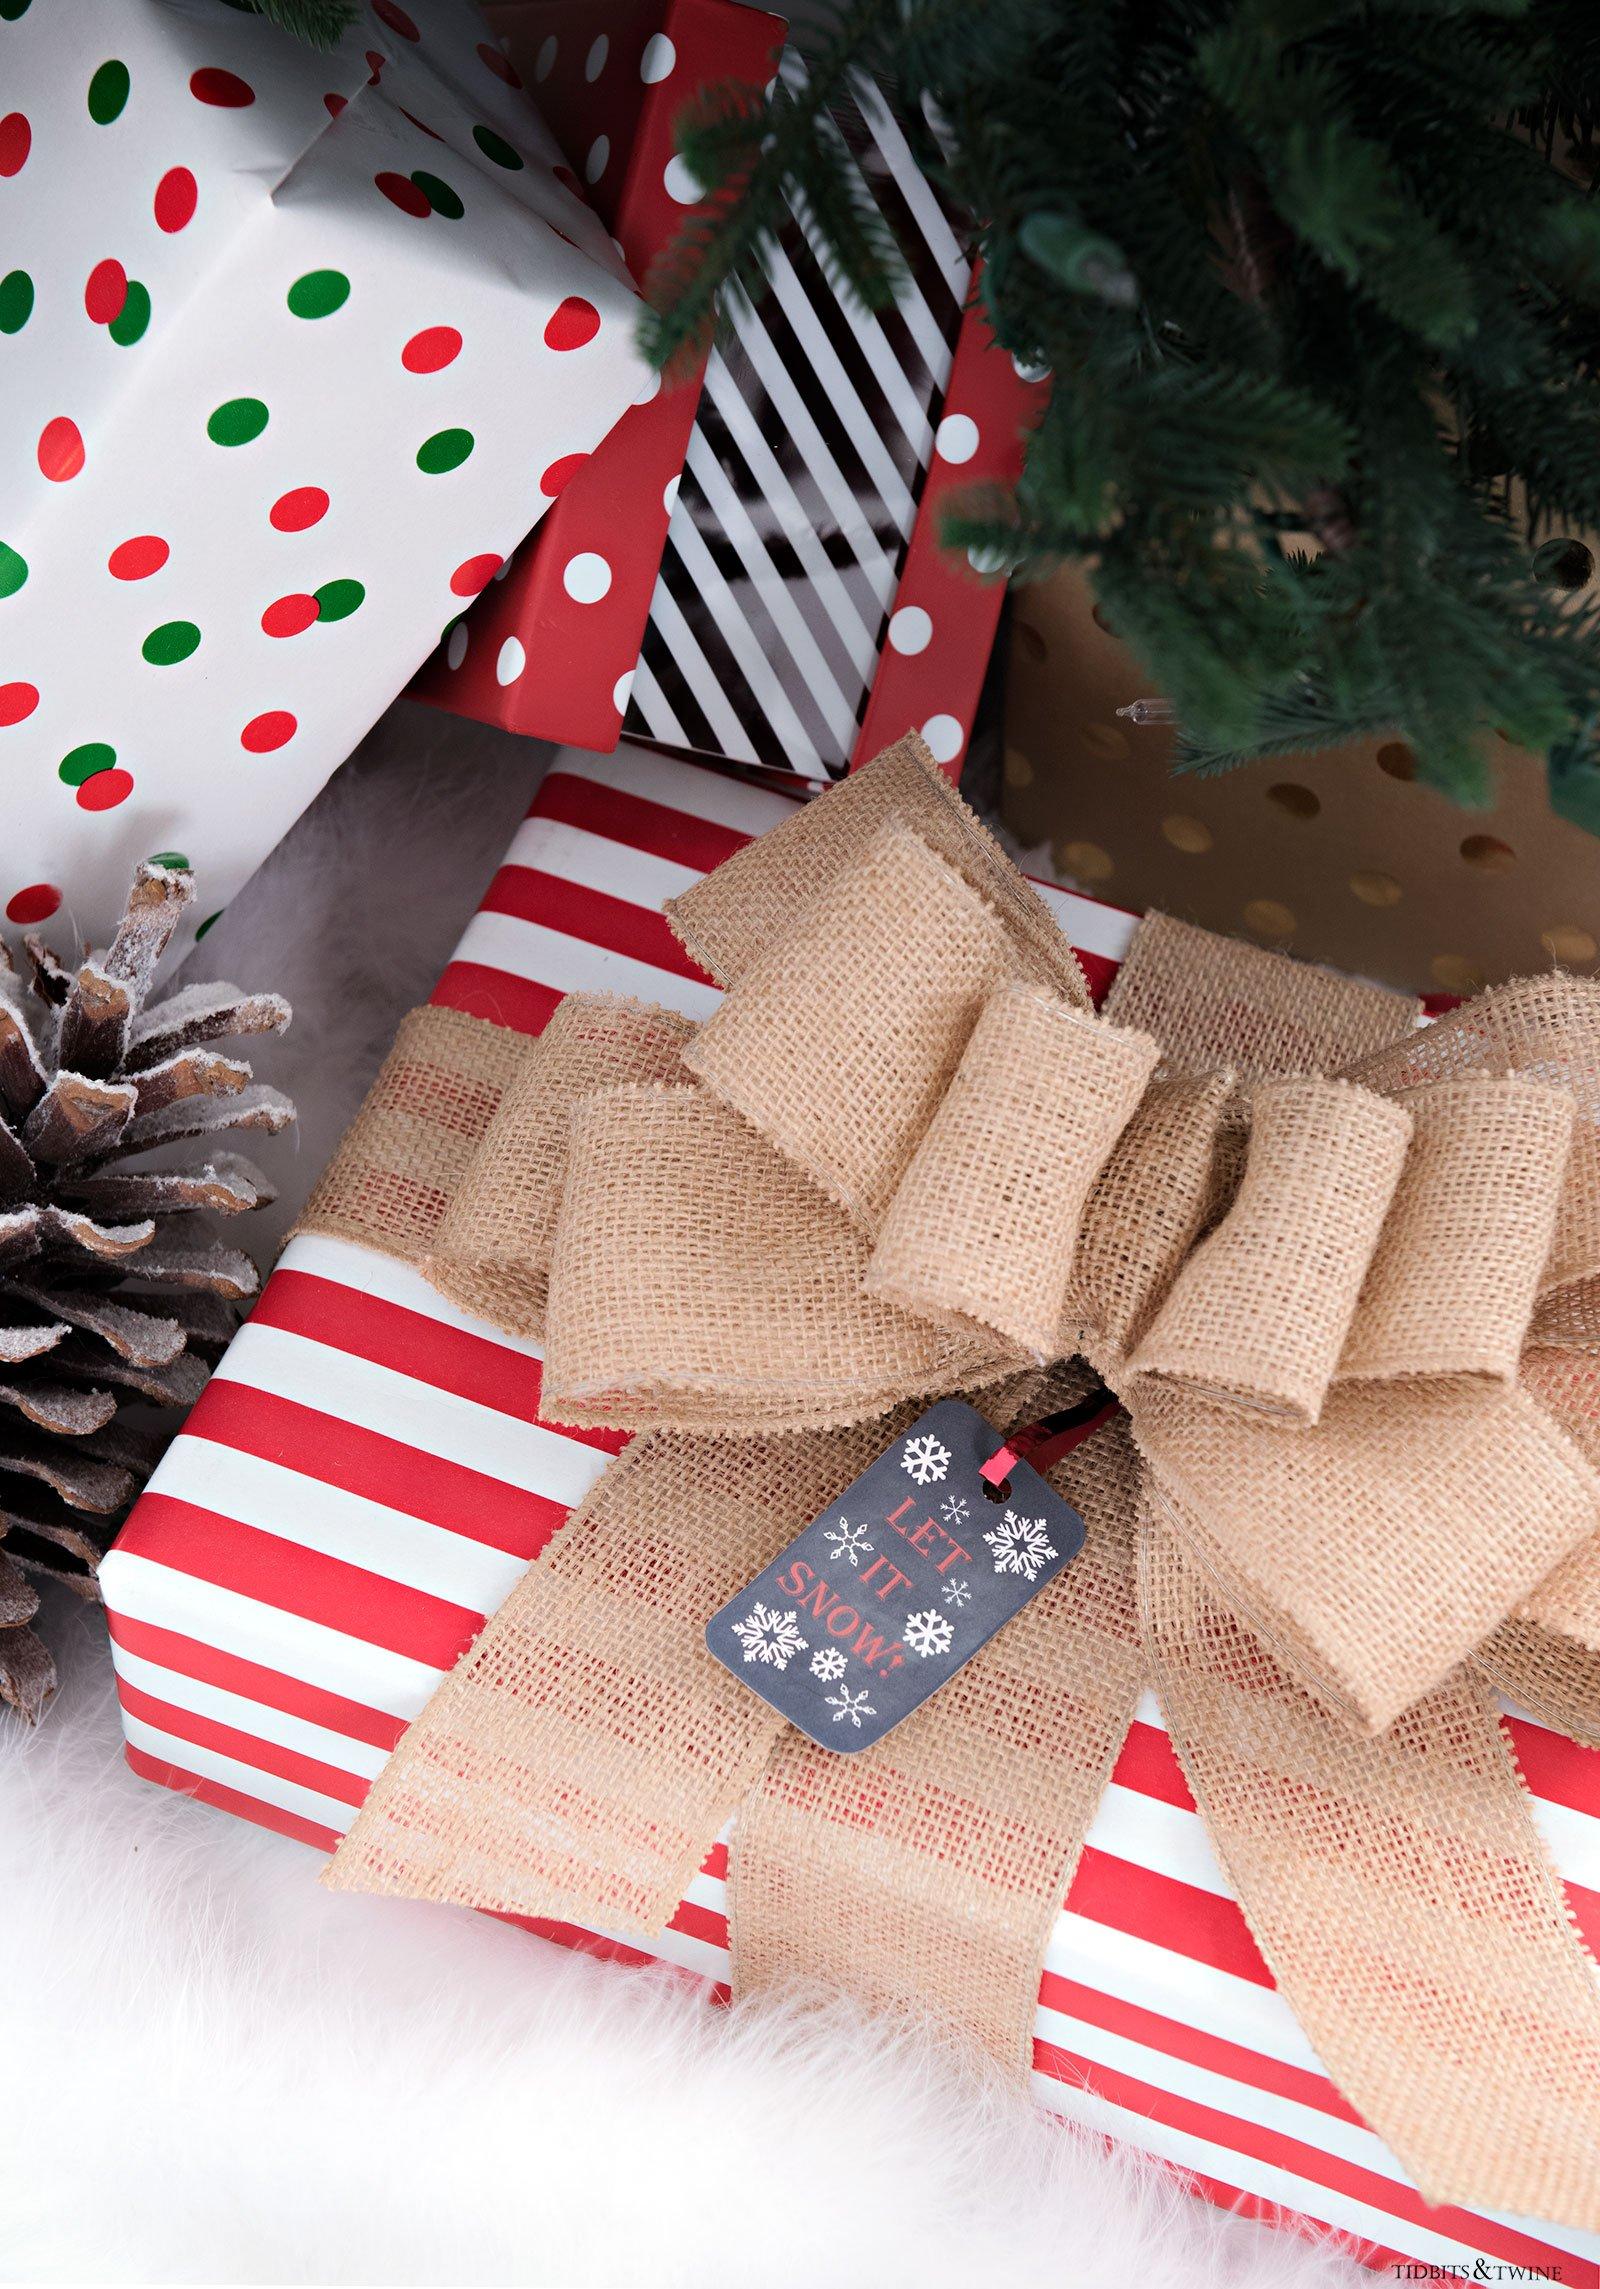 Free printable Christmas gift tags from Tidbits&Twine